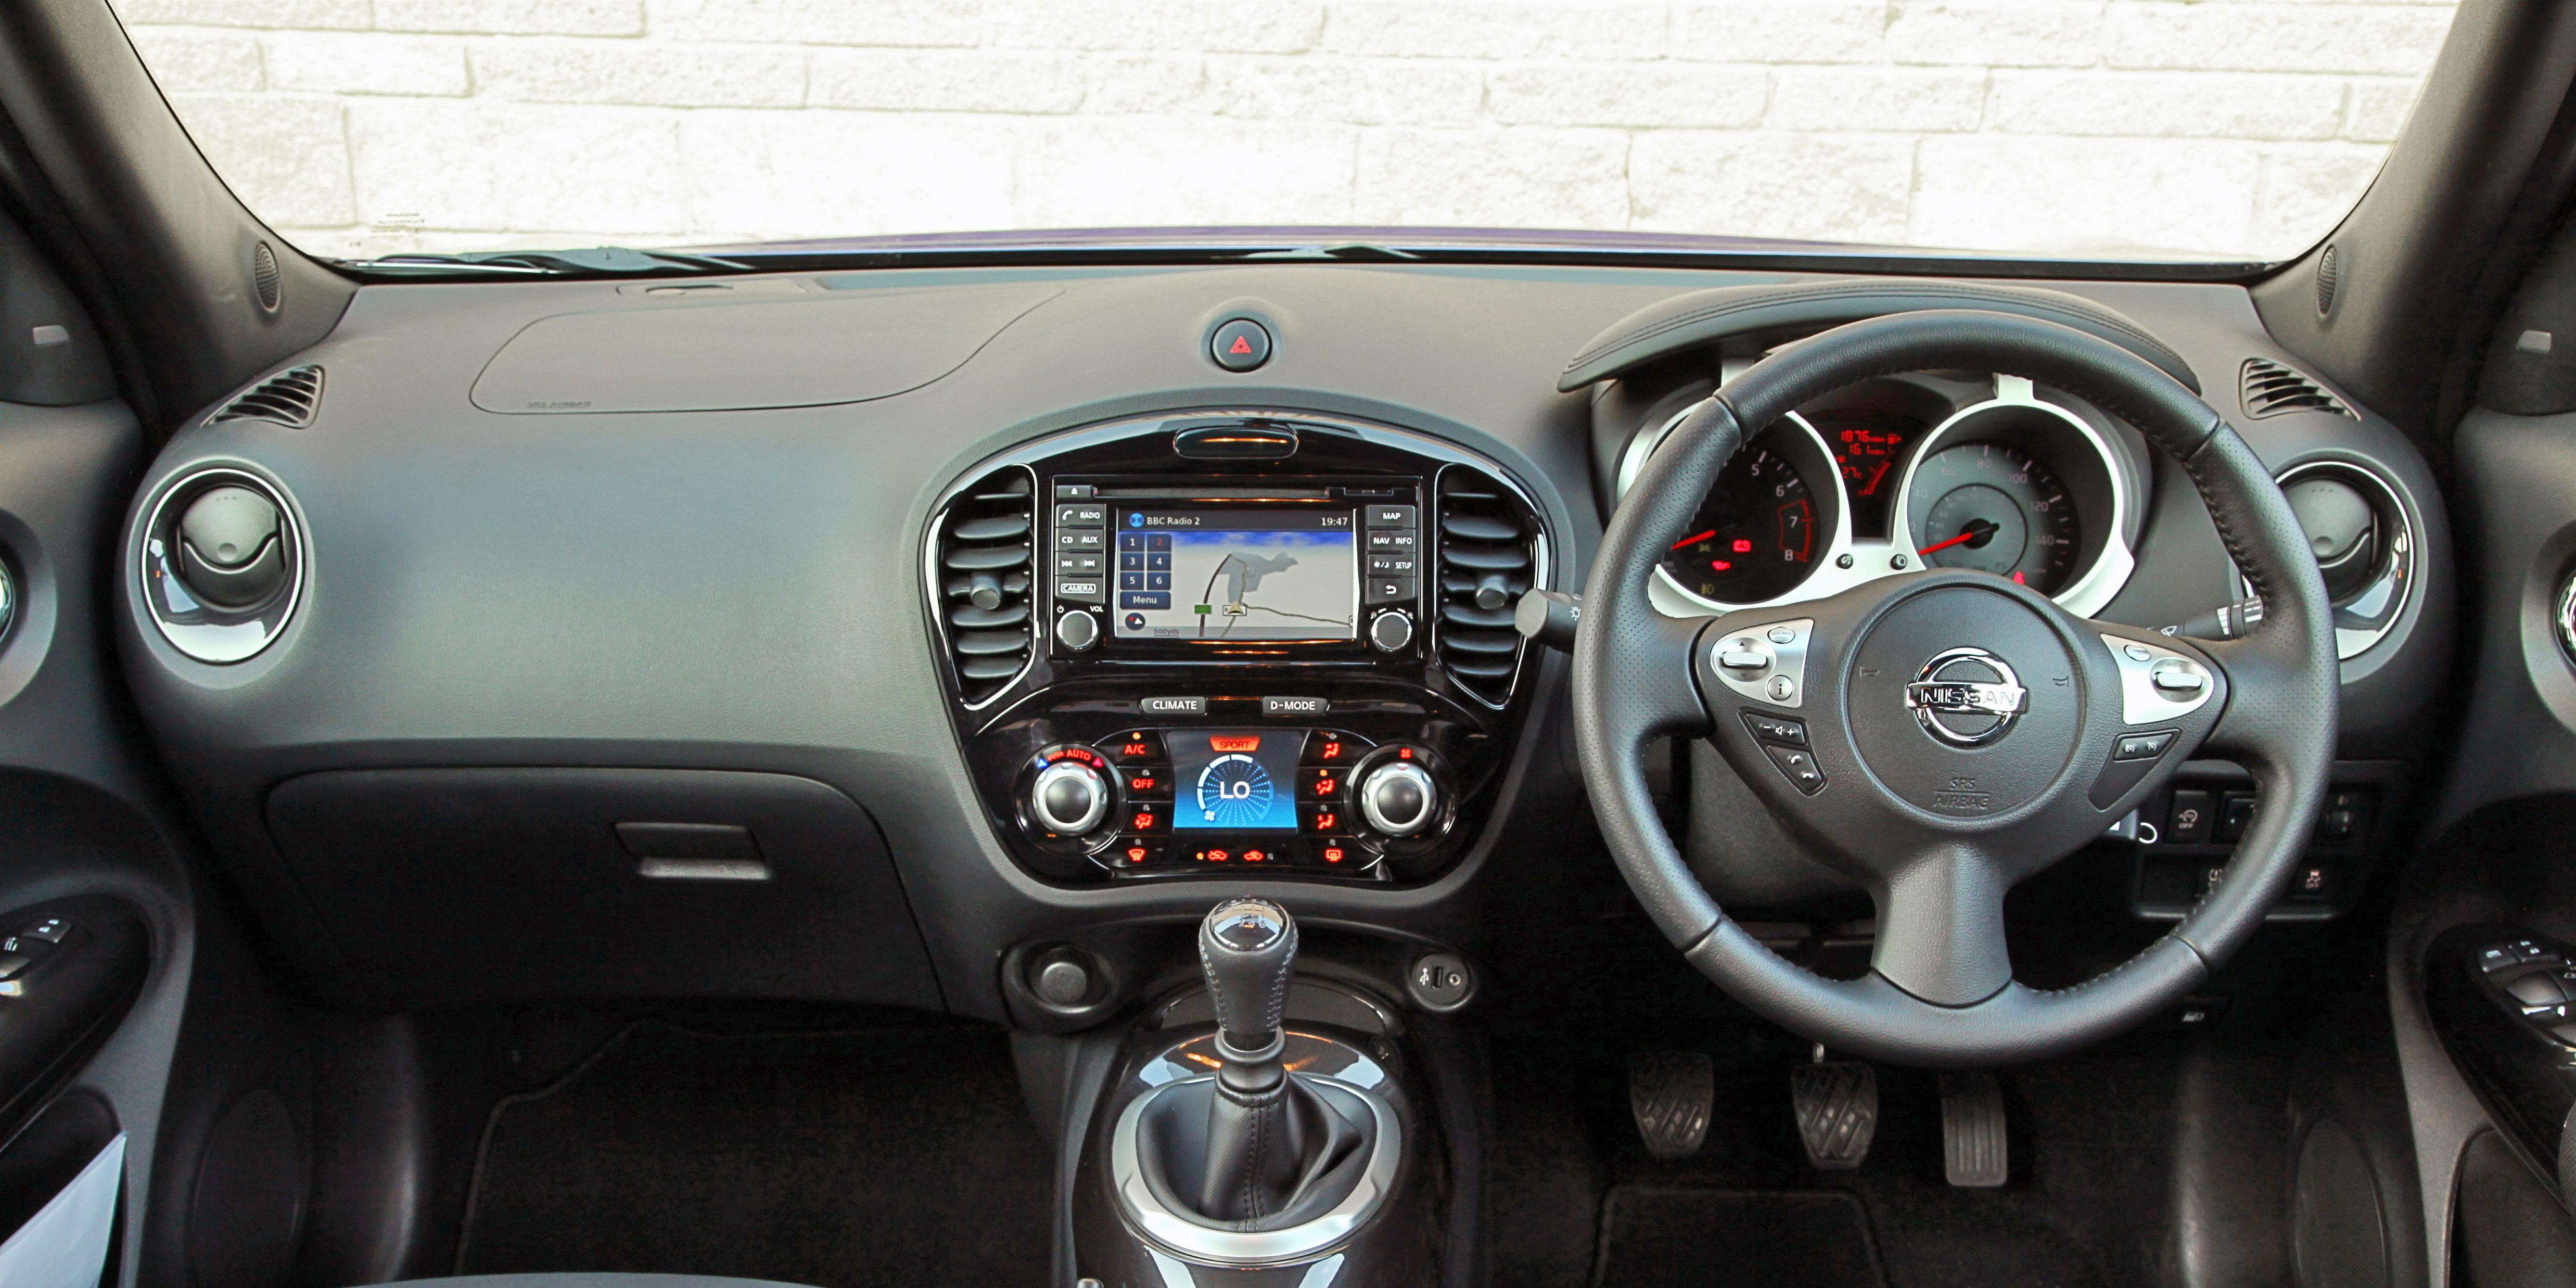 Nissan Juke Interior & Infotainment | carwow